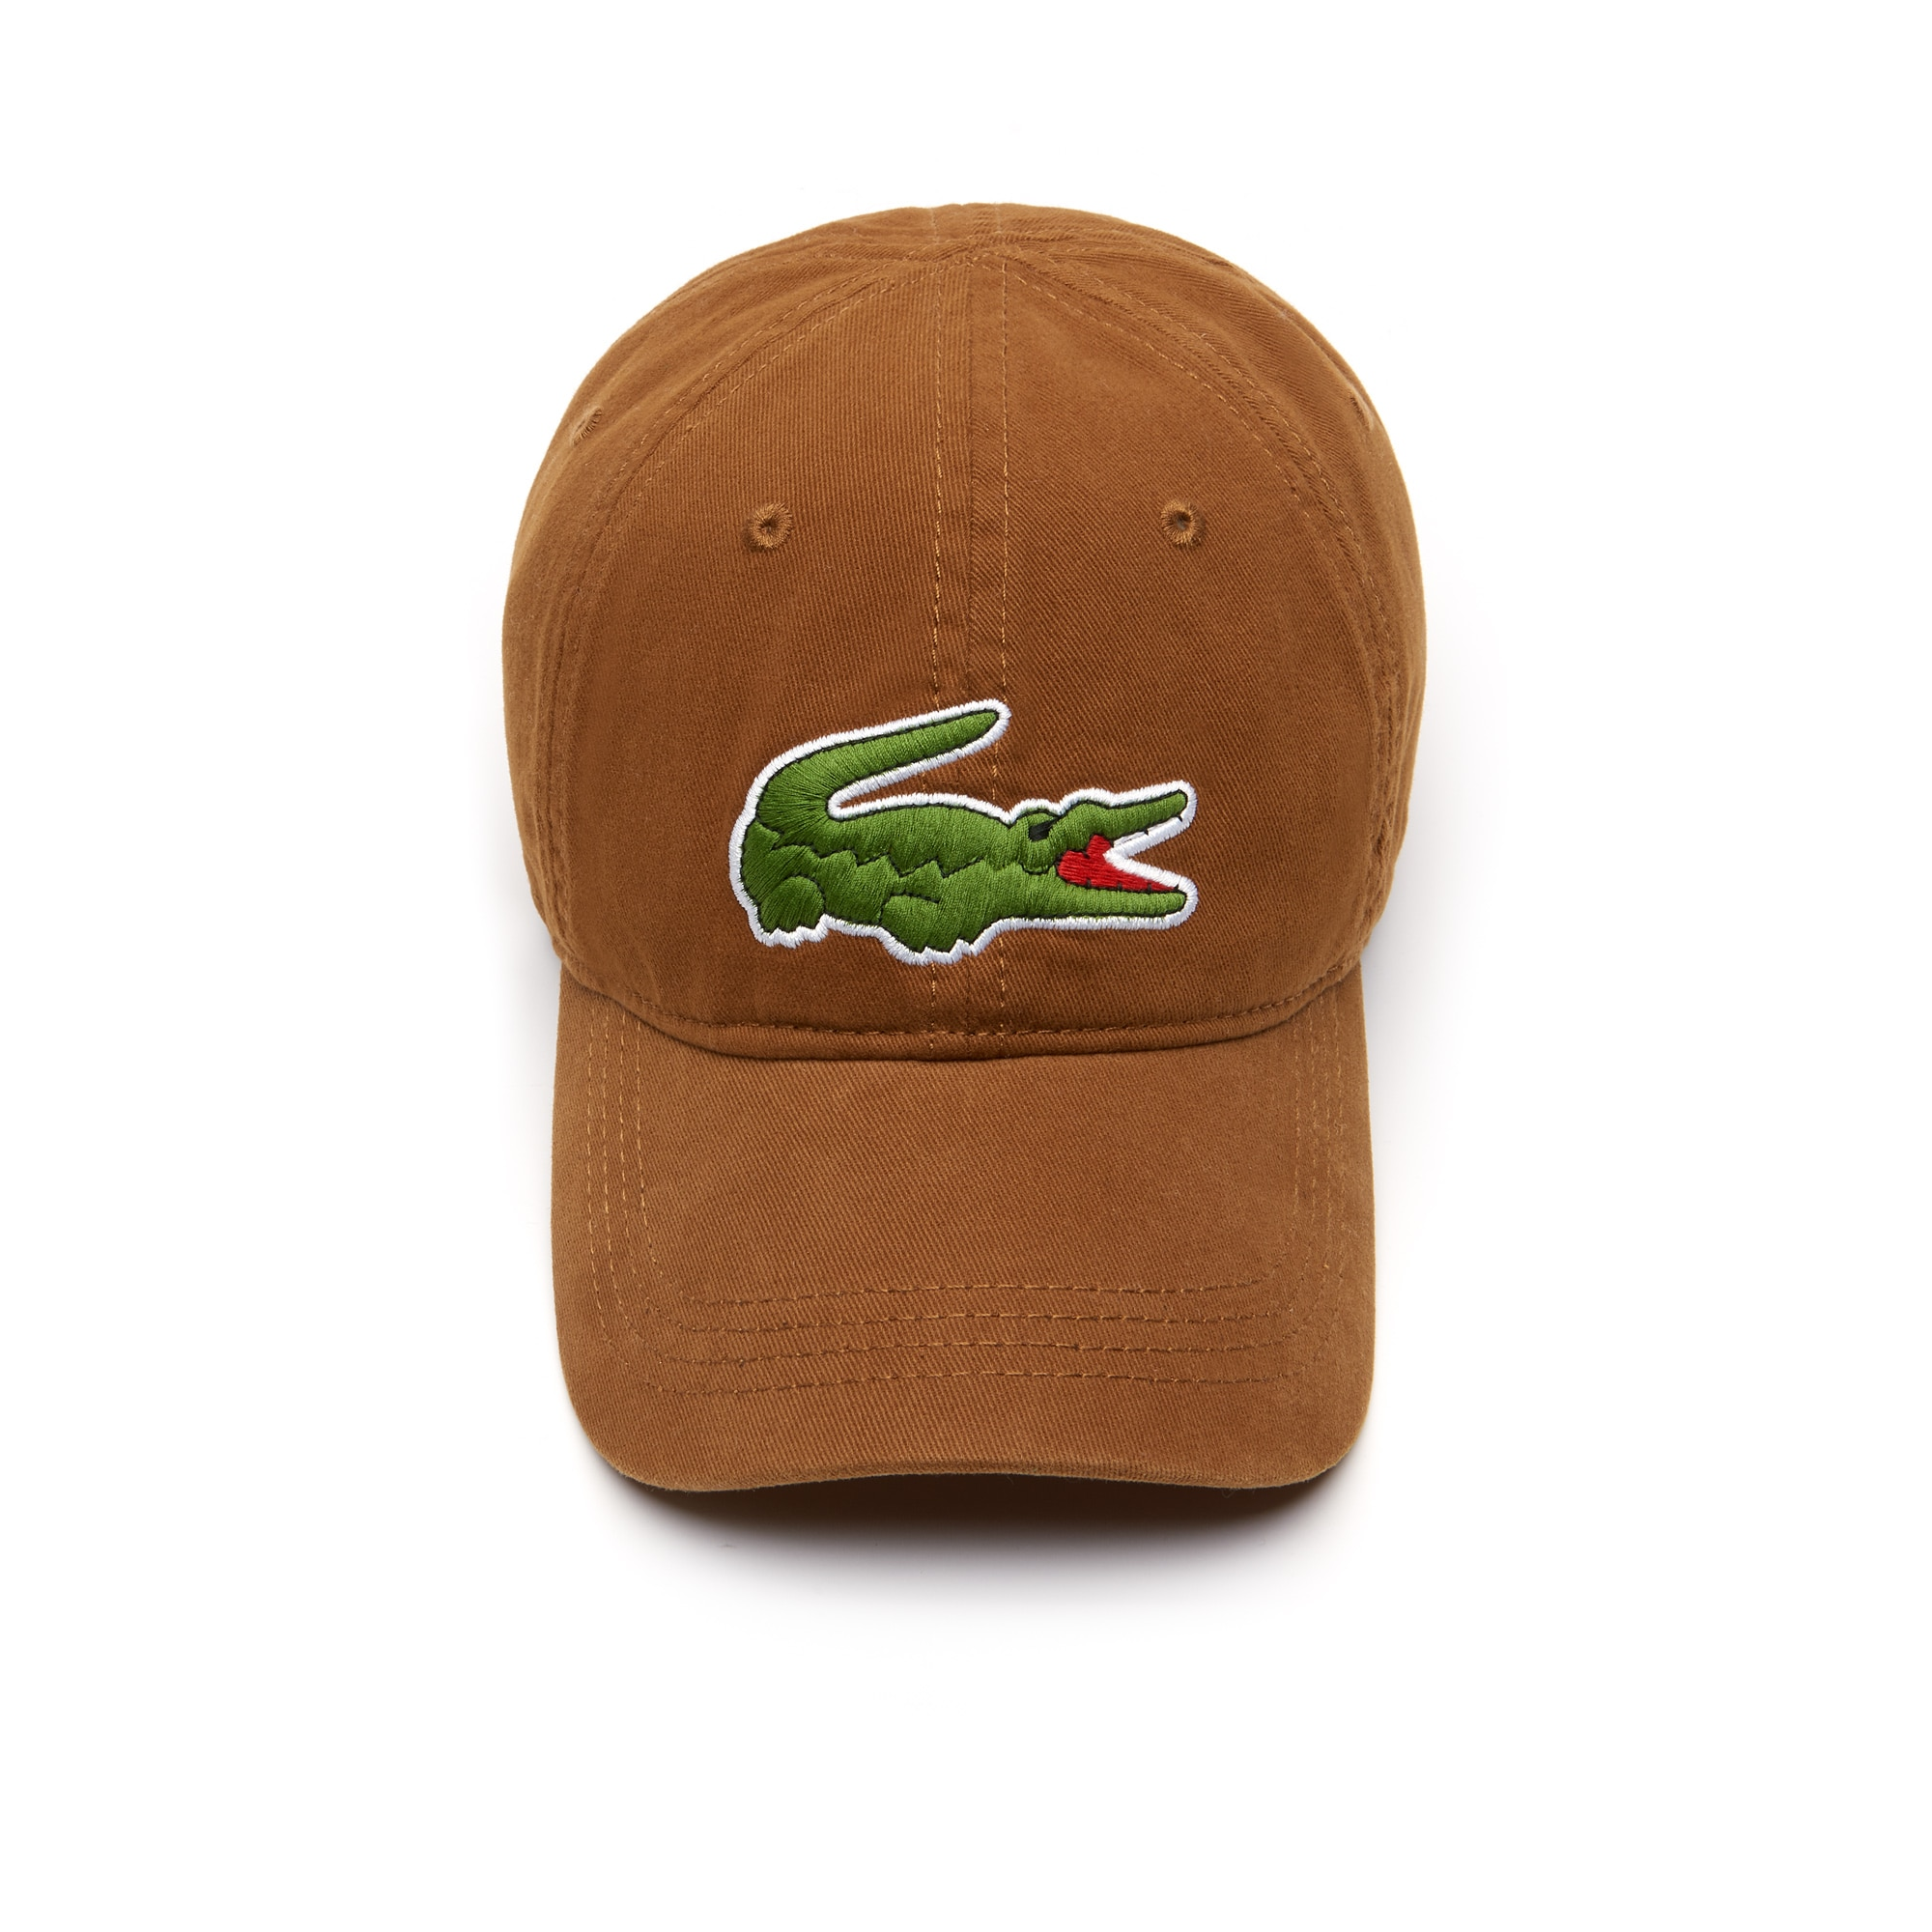 Lacoste - Gorra Big Croc - 4